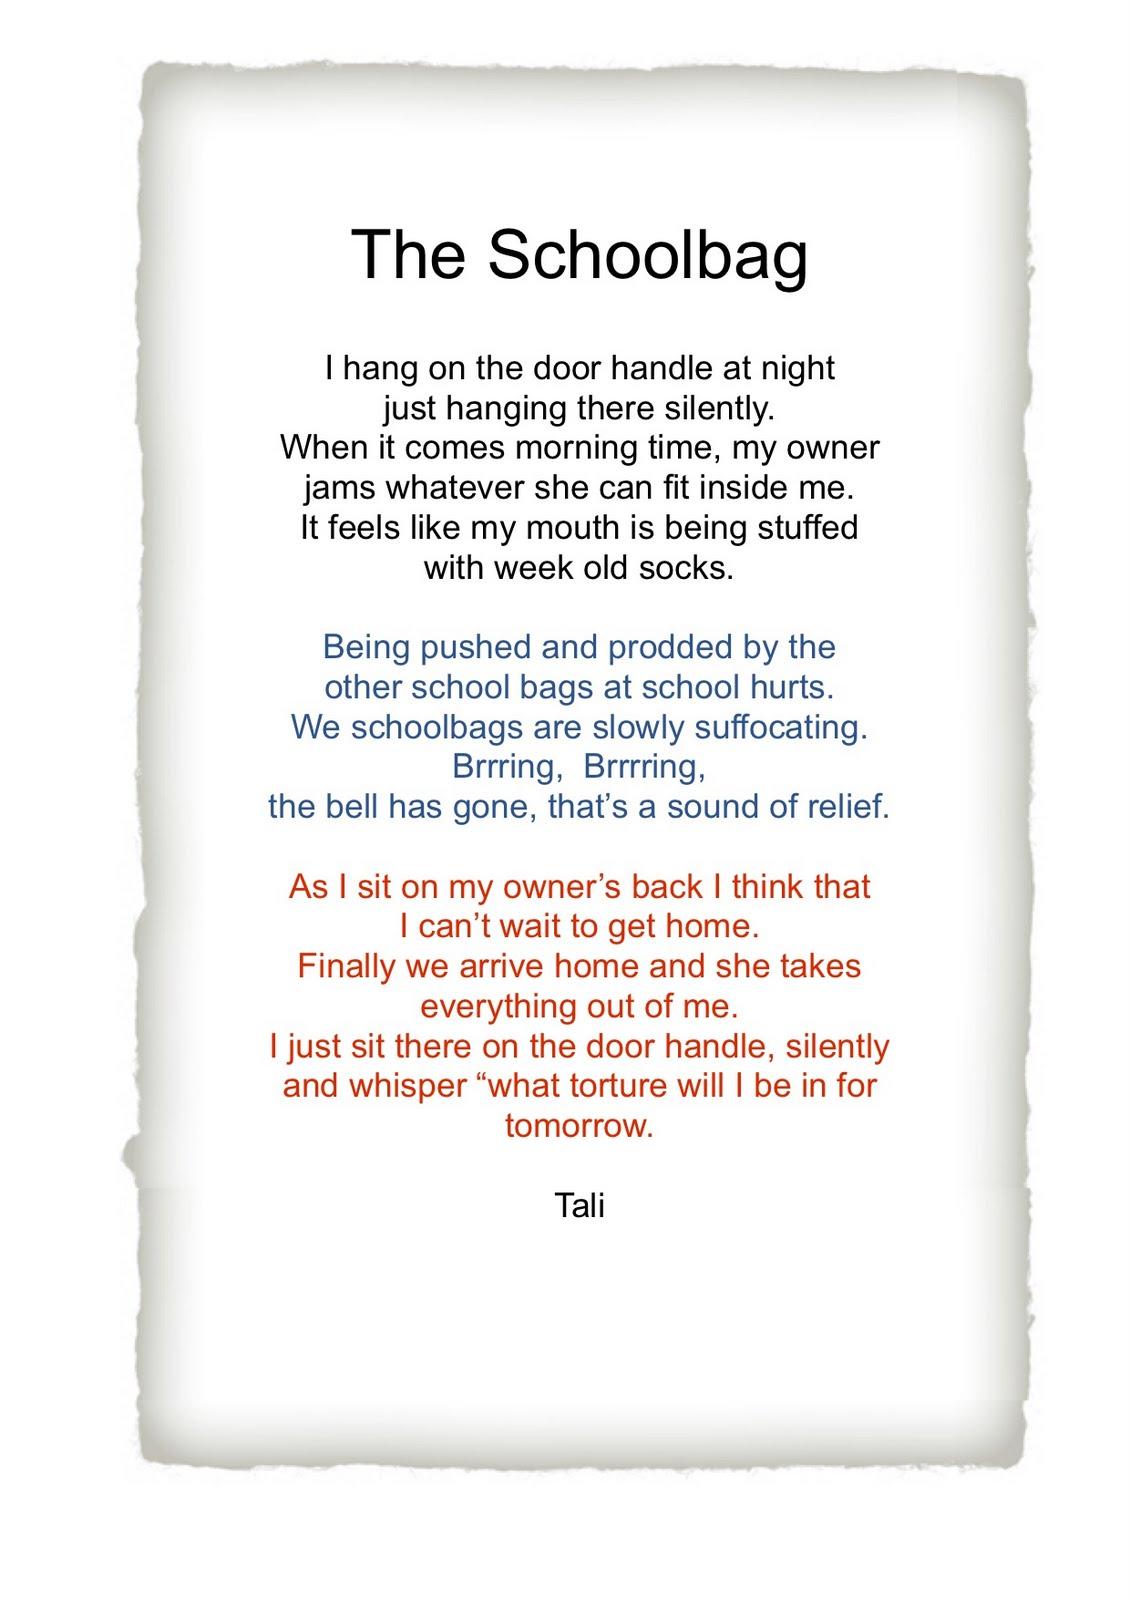 Room 12 Huia Range School: NARRATIVE WRITING